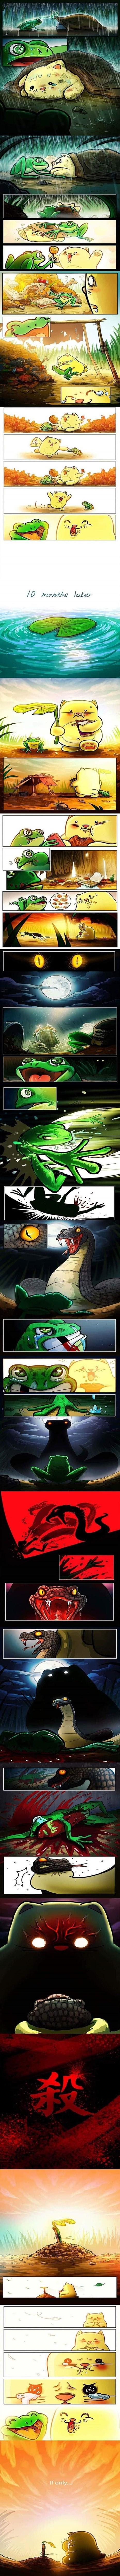 historia triste de una amiga de rana